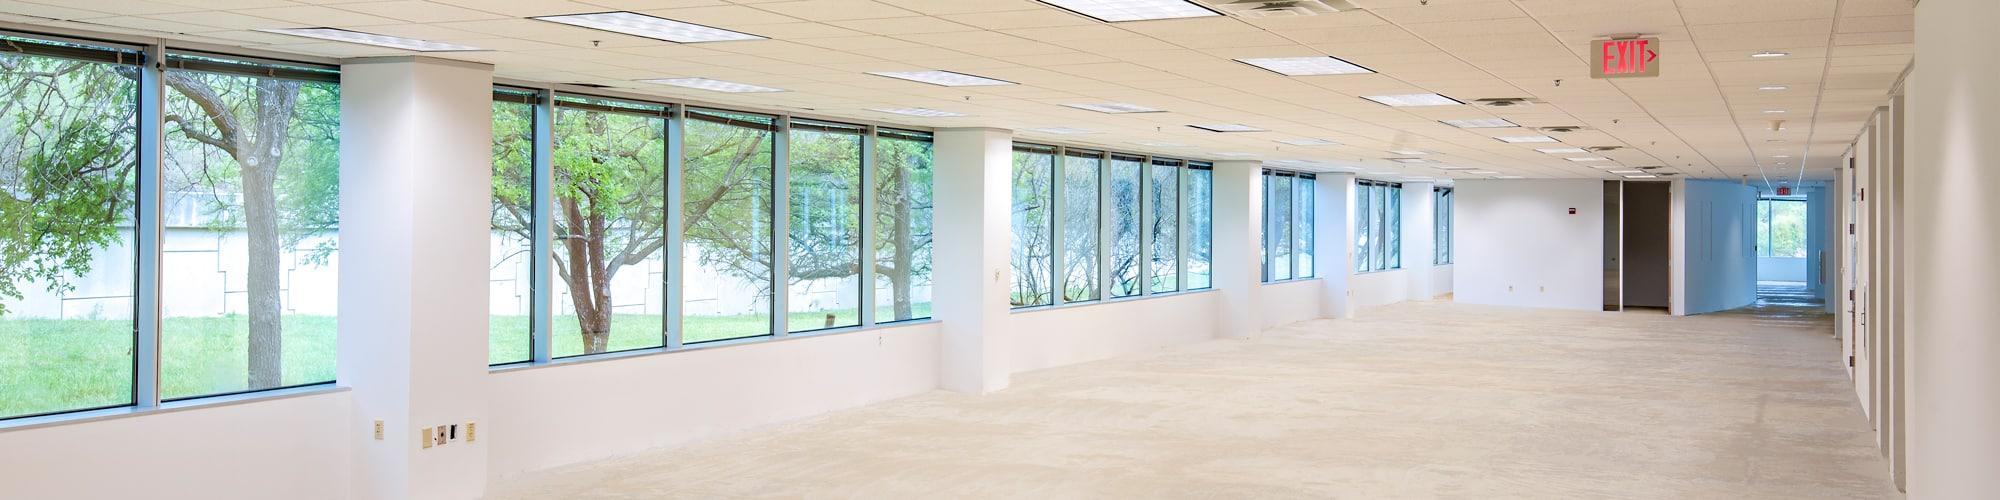 Park Centre | 8601 Ranch Road 2222 | Office Build Out